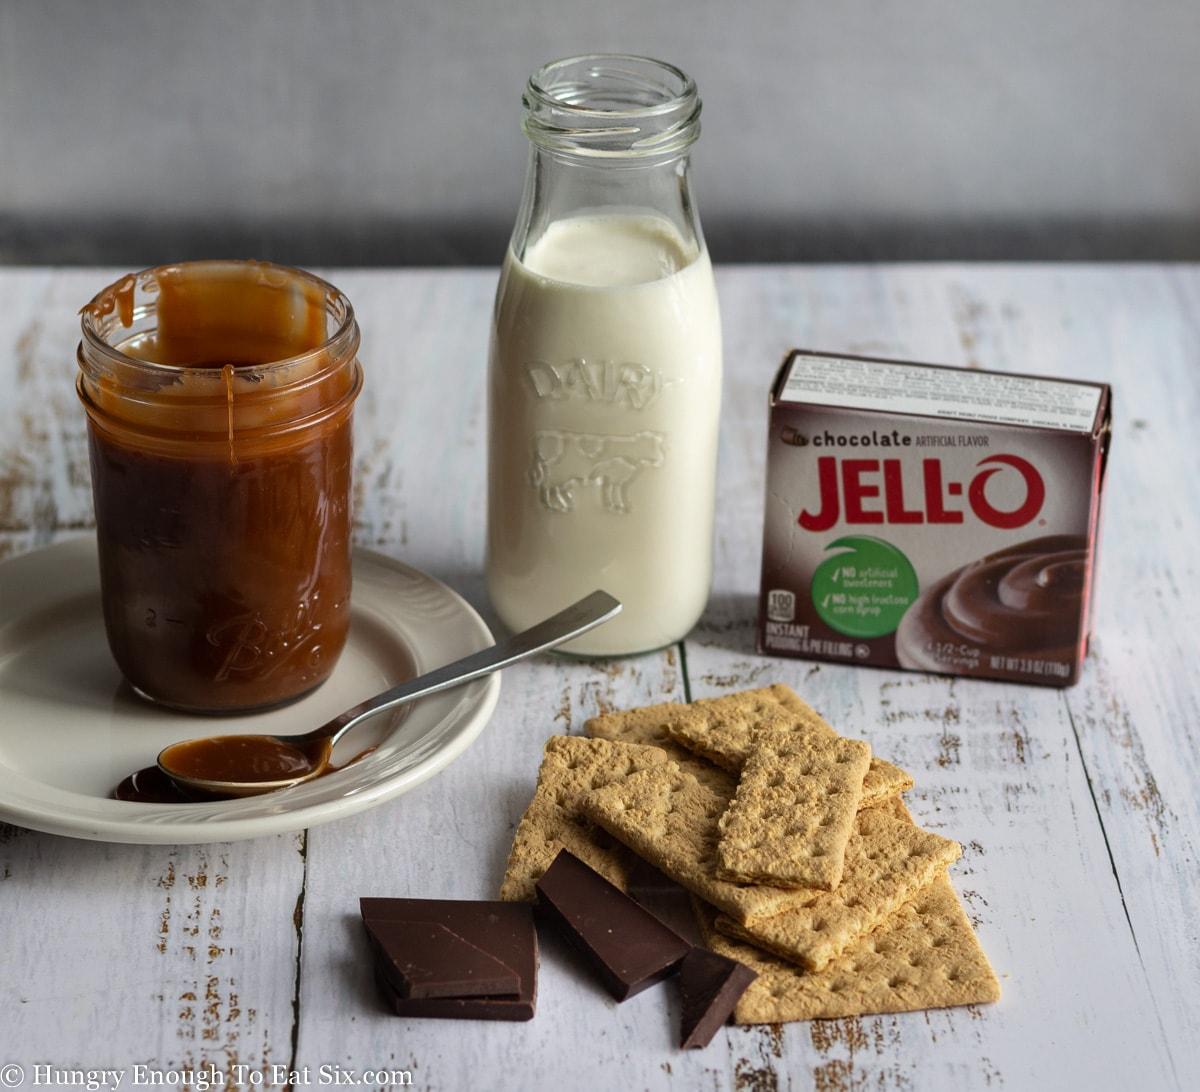 Caramel, cream, graham crackers and a Jell-o box.